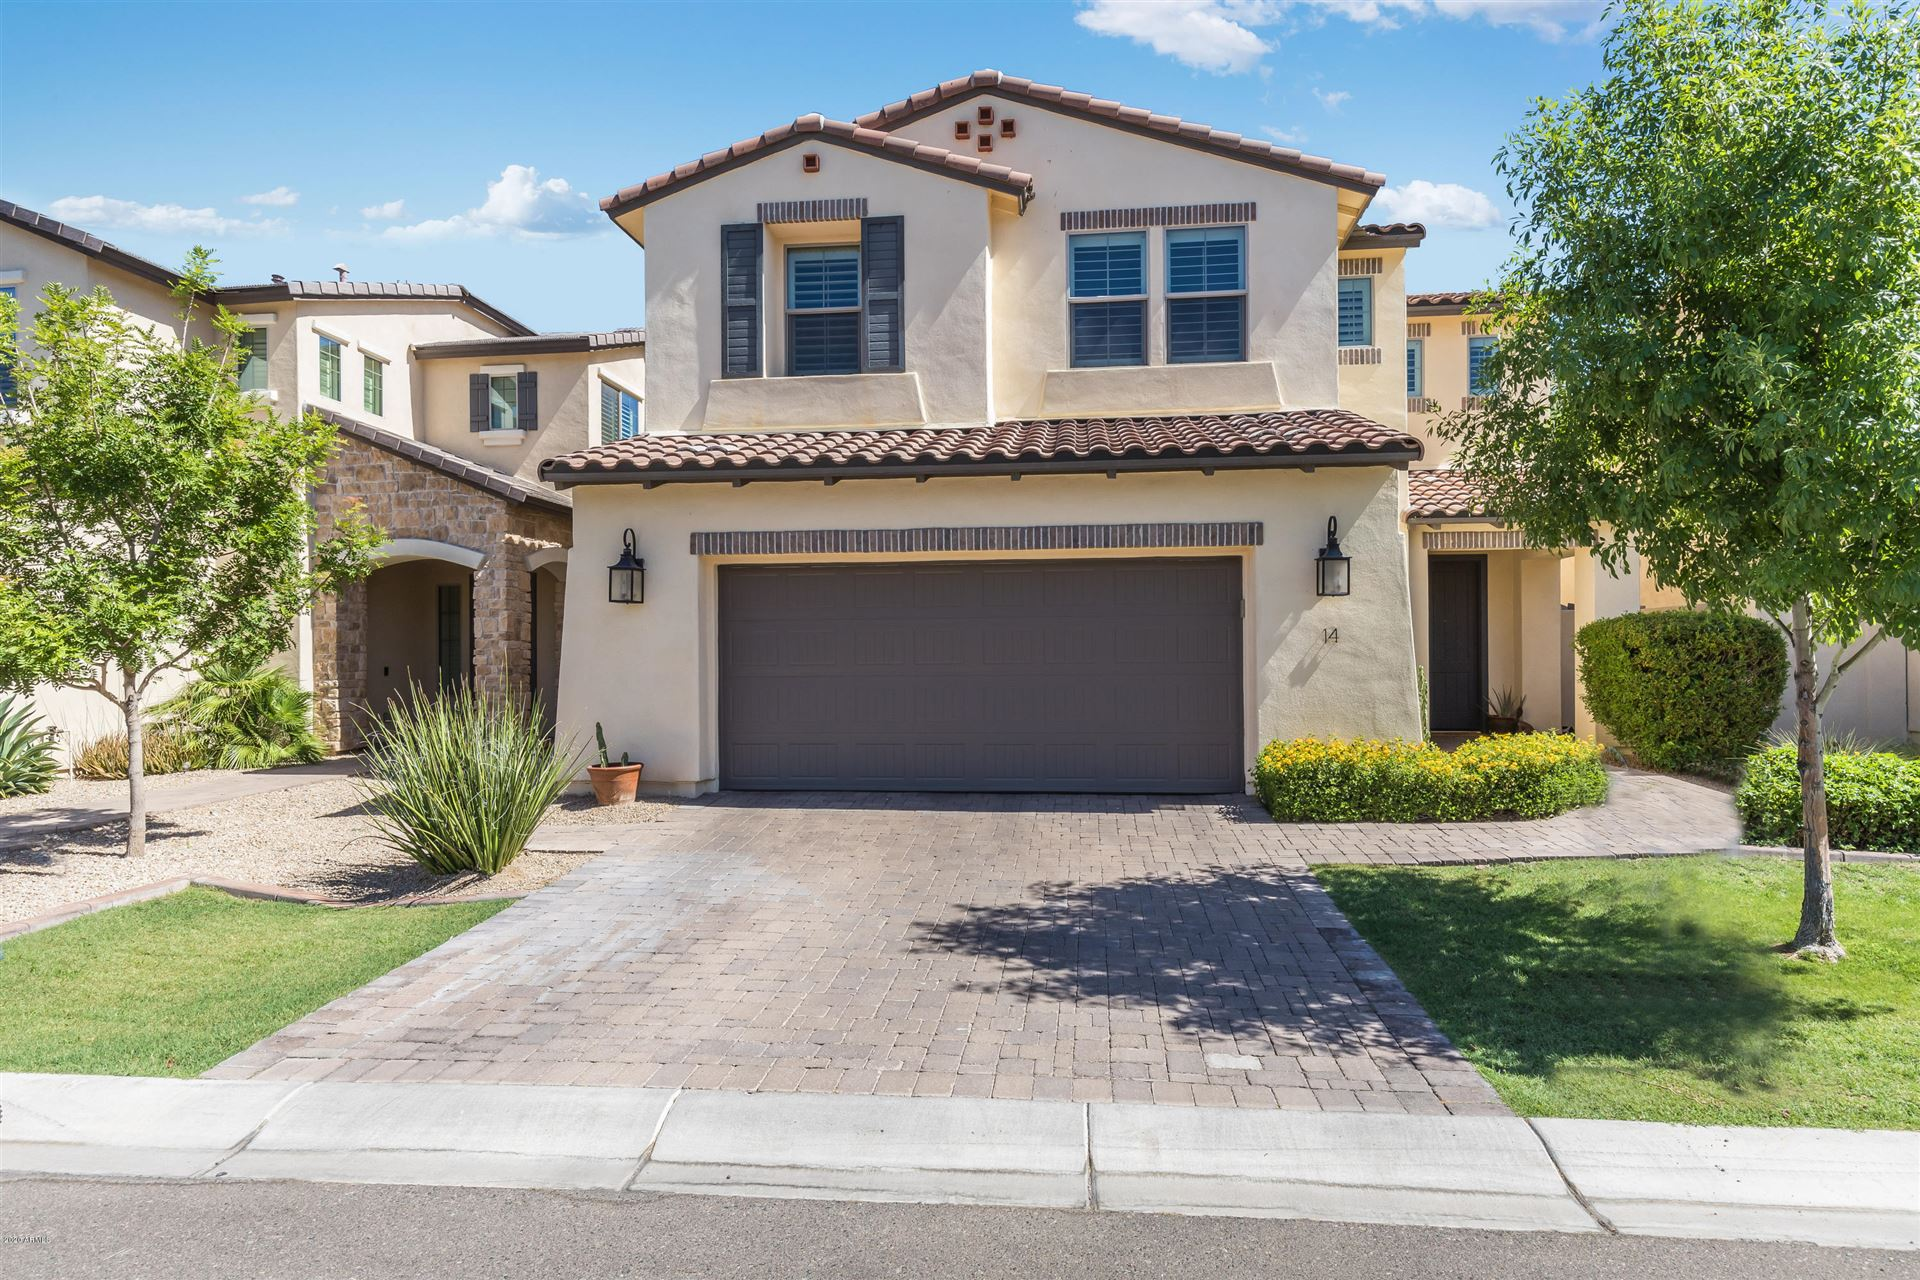 Property Image Of 14 E Laurie Lane In Phoenix, Az